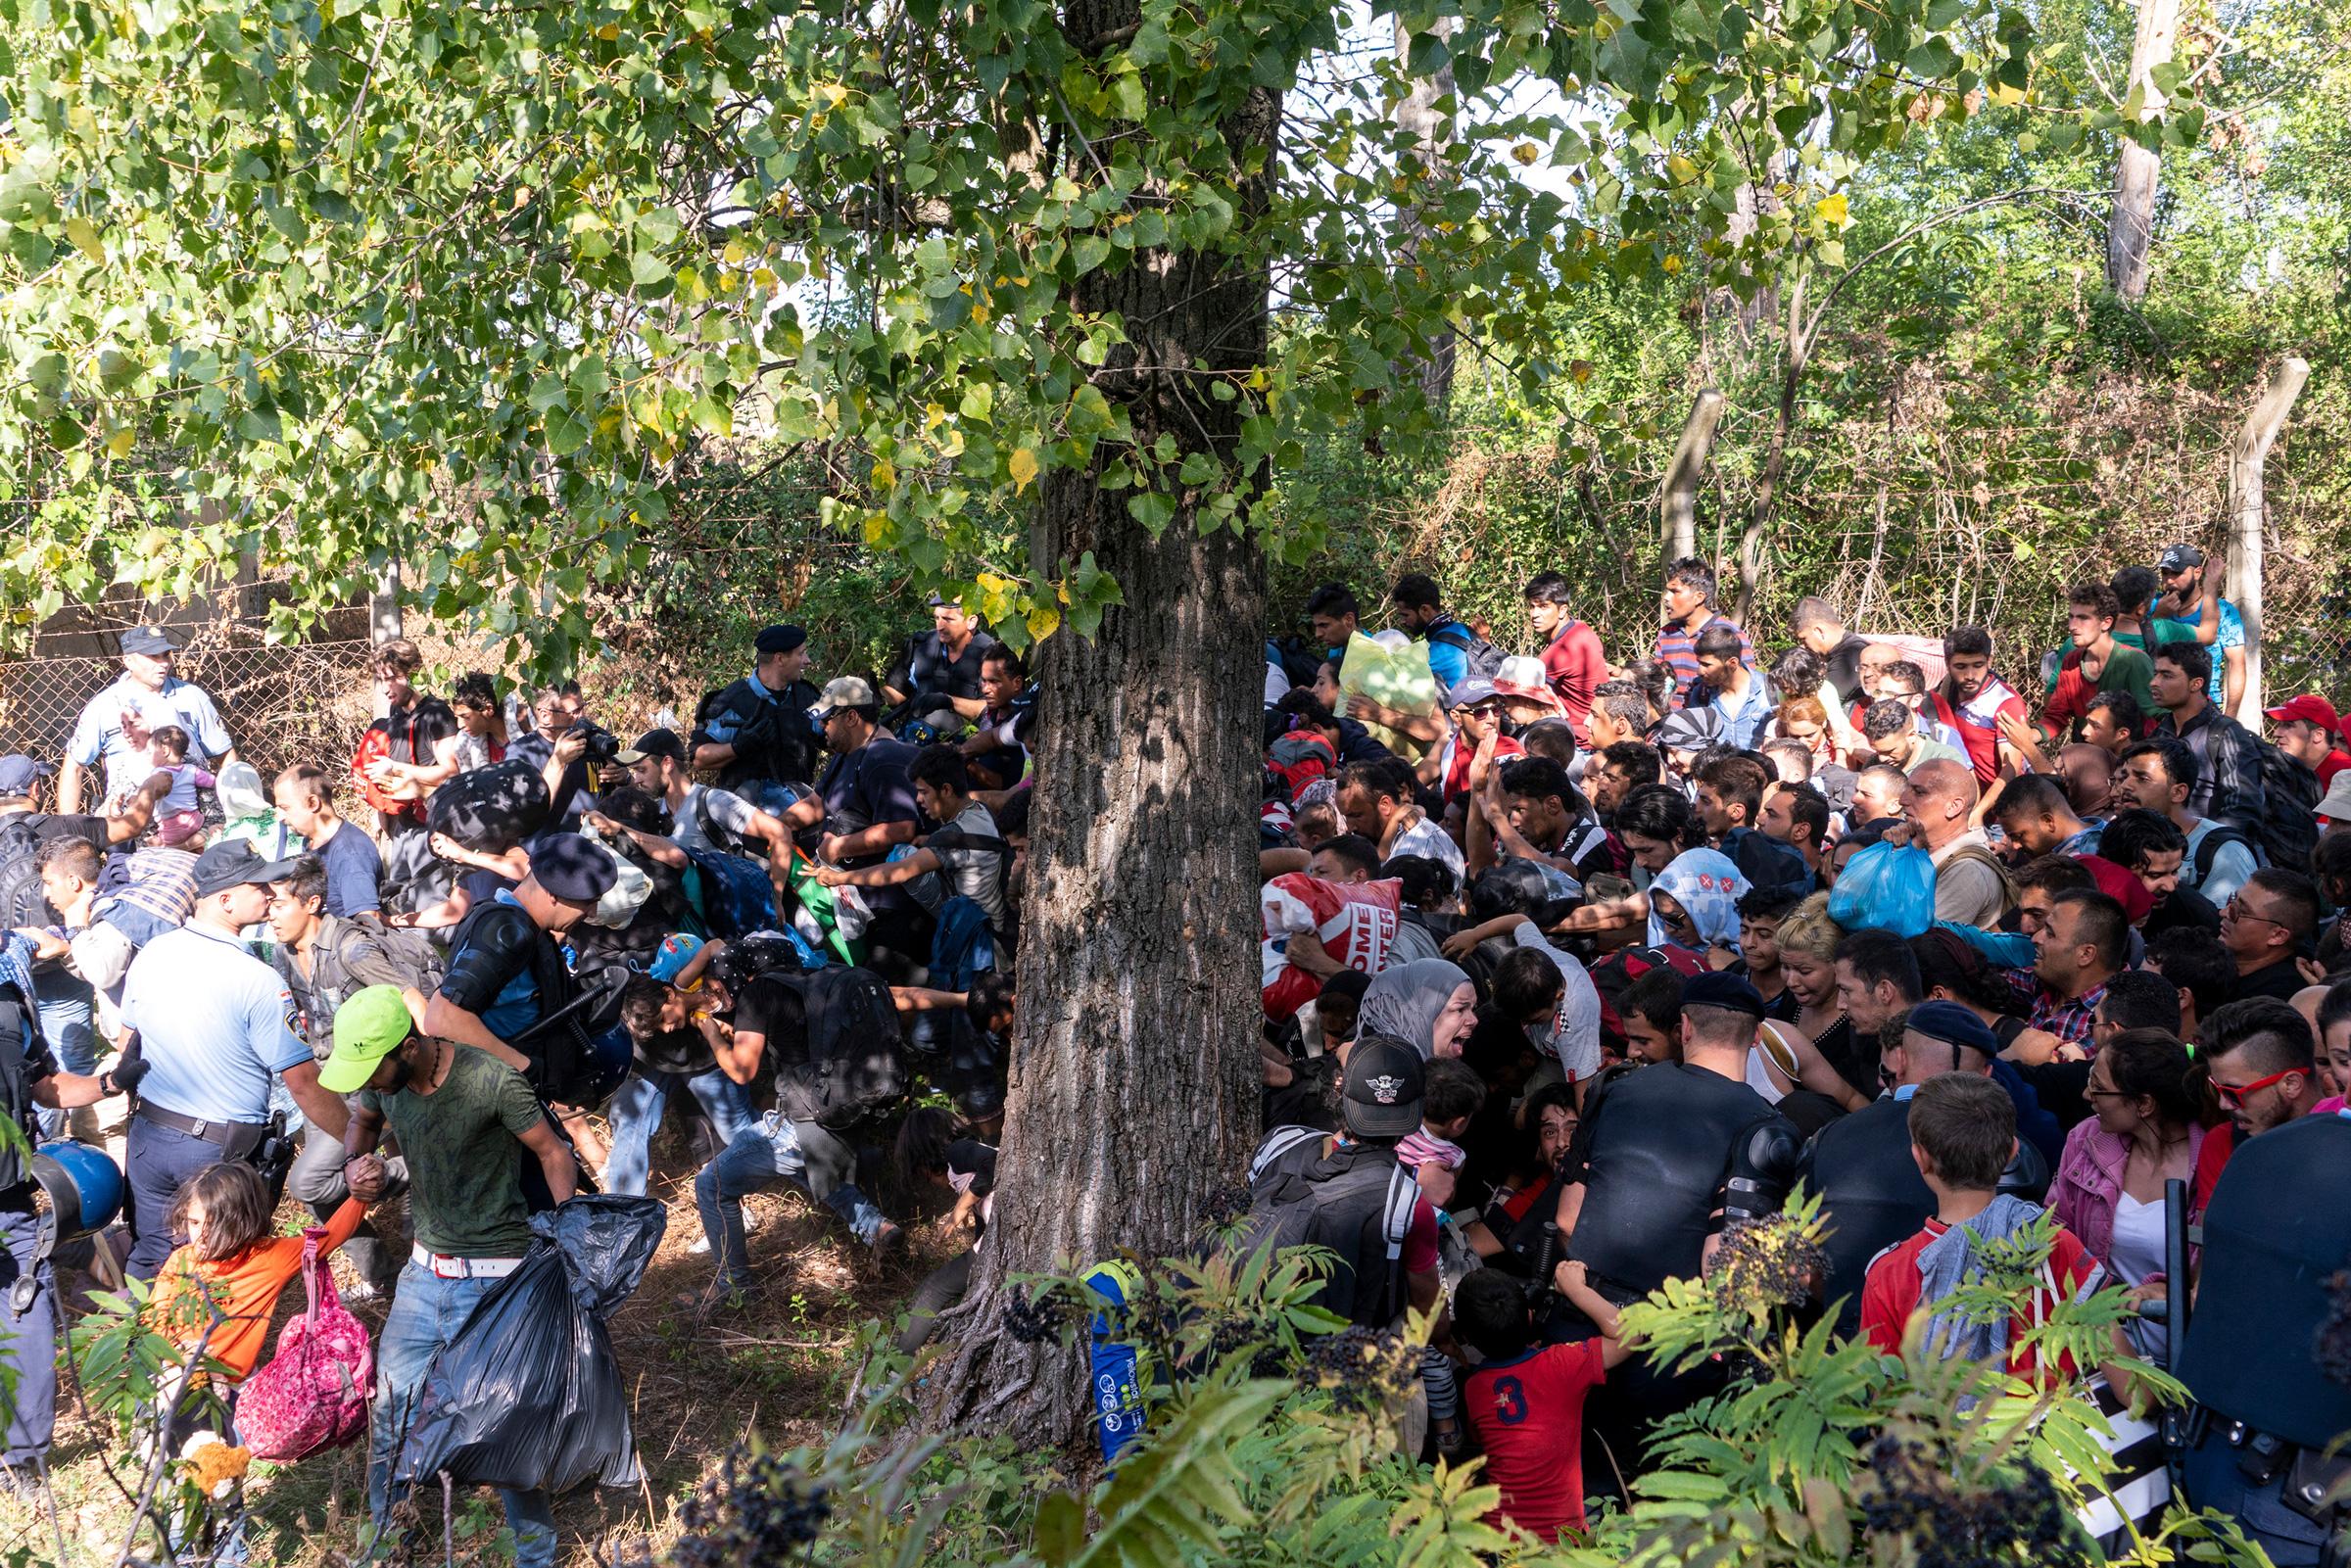 Refugees crash through police lines in Tovarnik, Croatia, during the height of the refugee crisis. Tovarnik, Croatia, 2015.